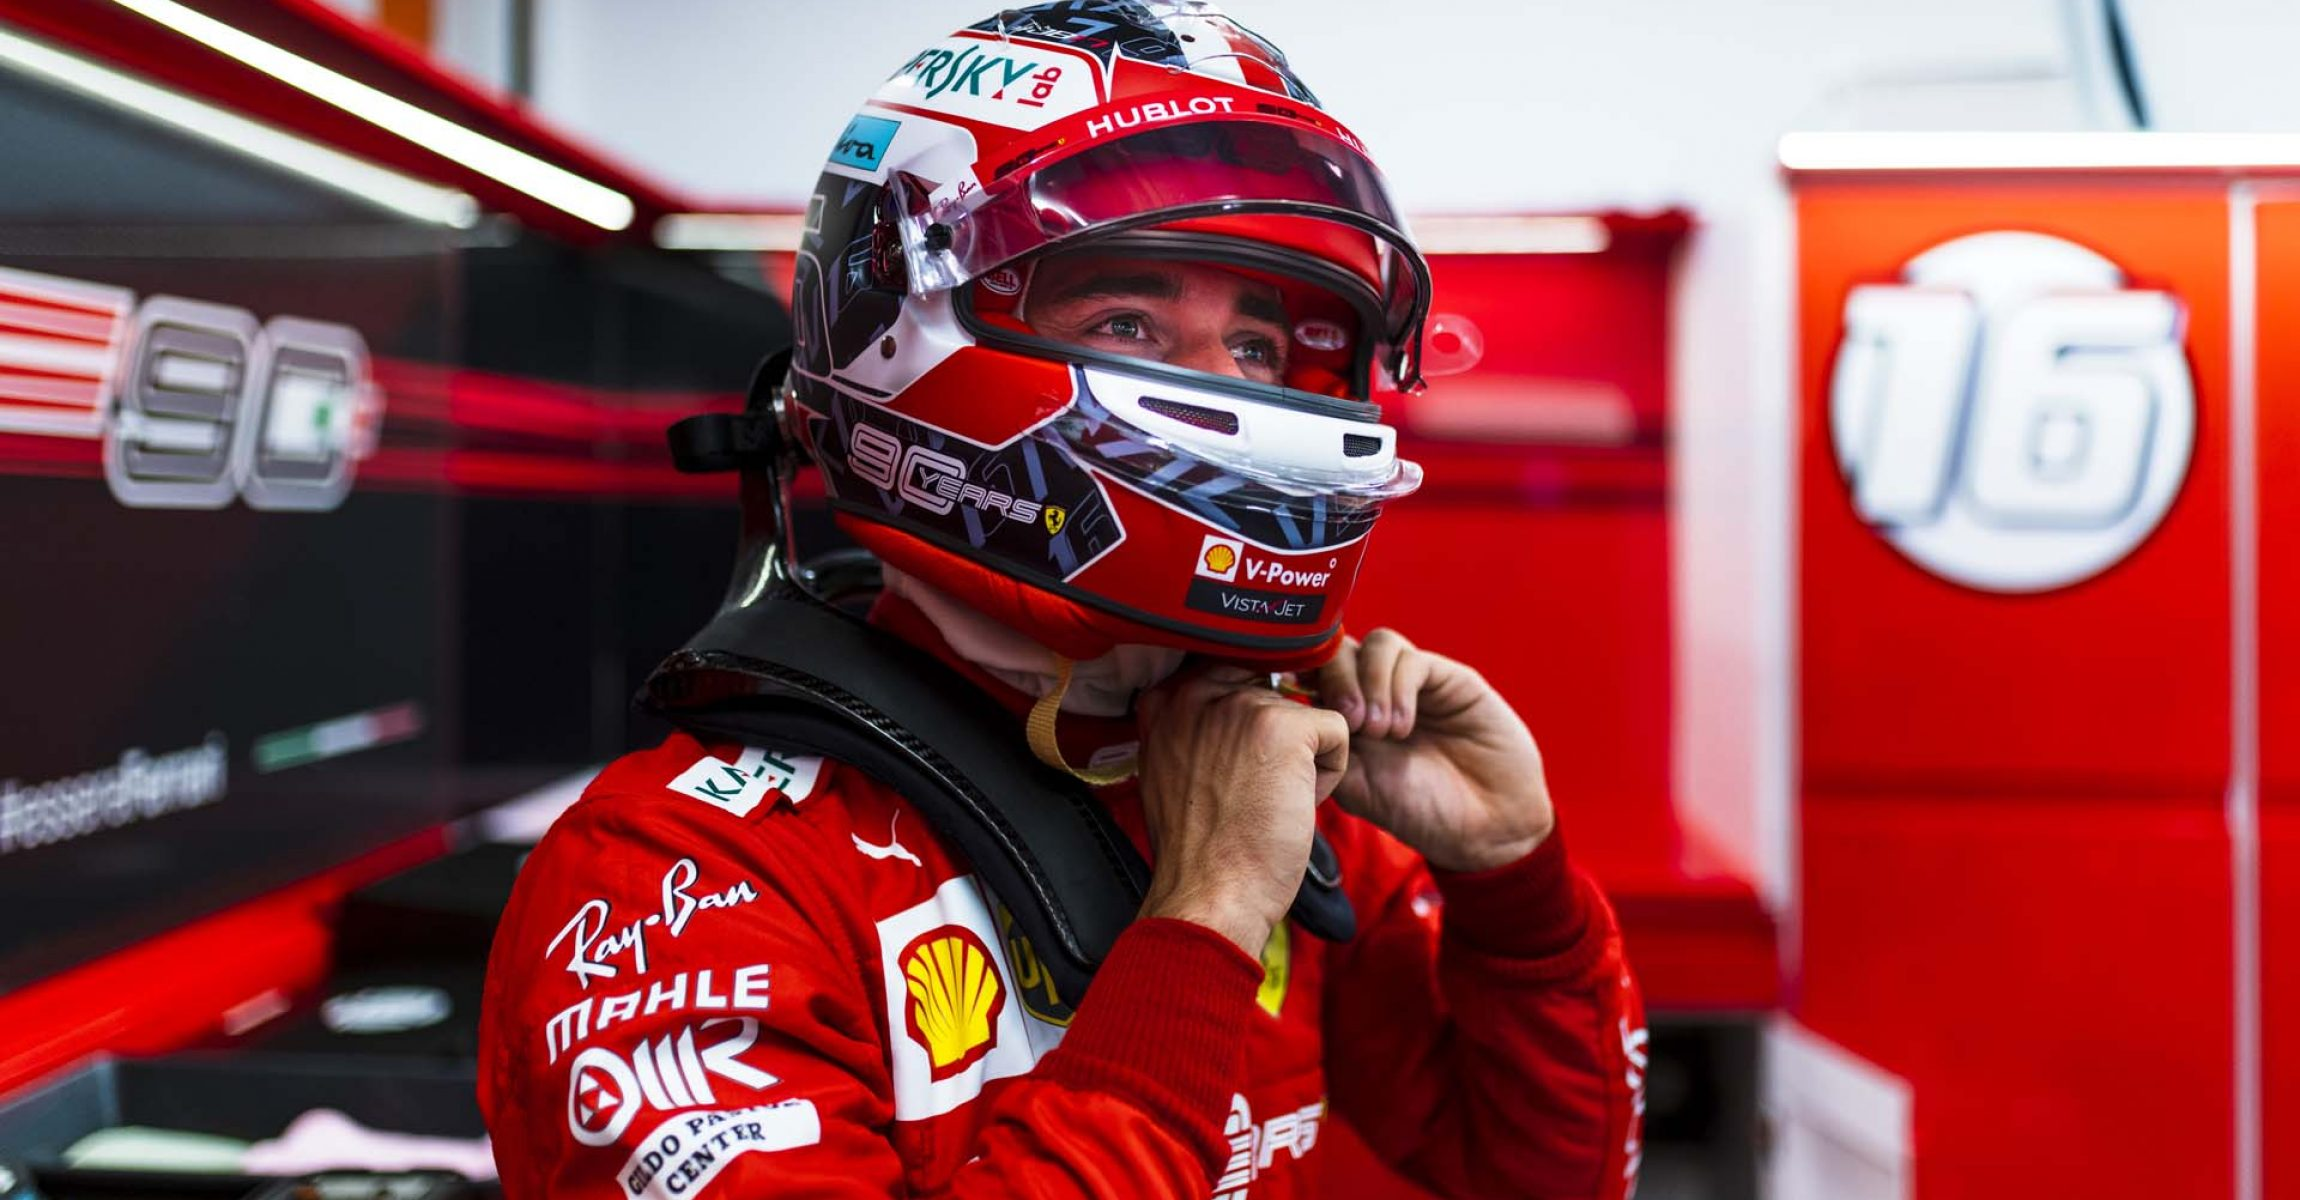 Charles Leclerc, Ferrari, Singapore Grand Prix 2019